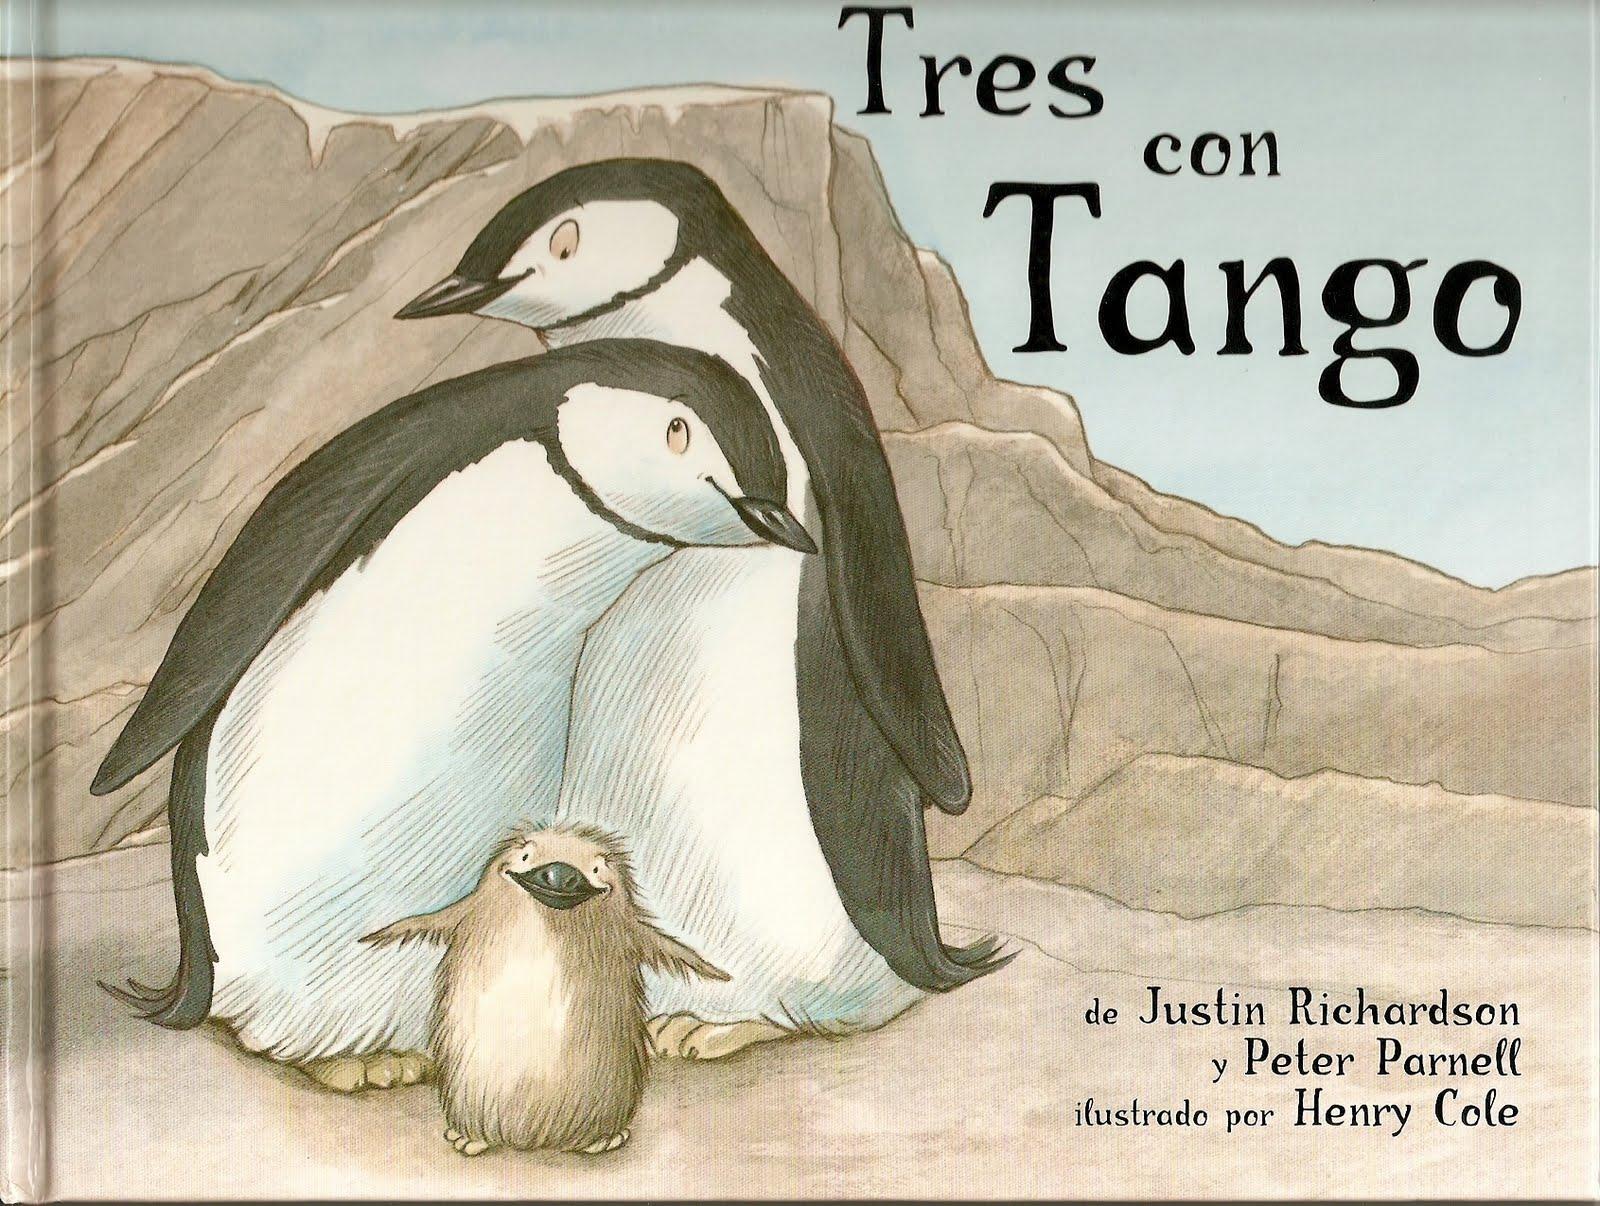 Tres-con-Tango cuento LGTB